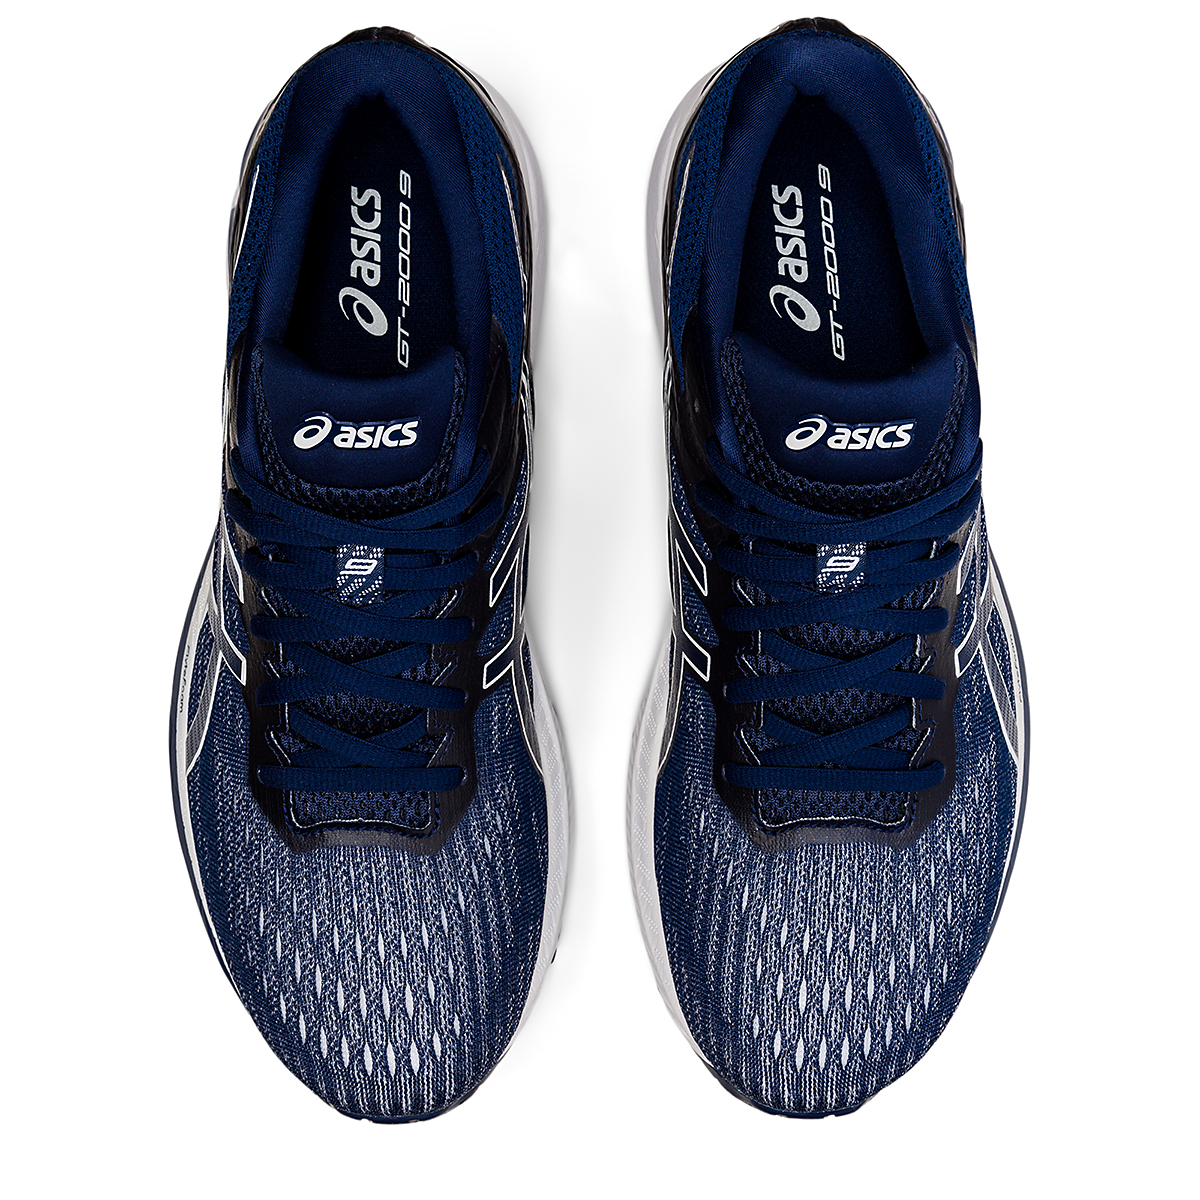 Men's Asics GT-2000 9 Running Shoe - Color: Blue Expanse - Size: 6 - Width: Regular, Blue Expanse, large, image 5